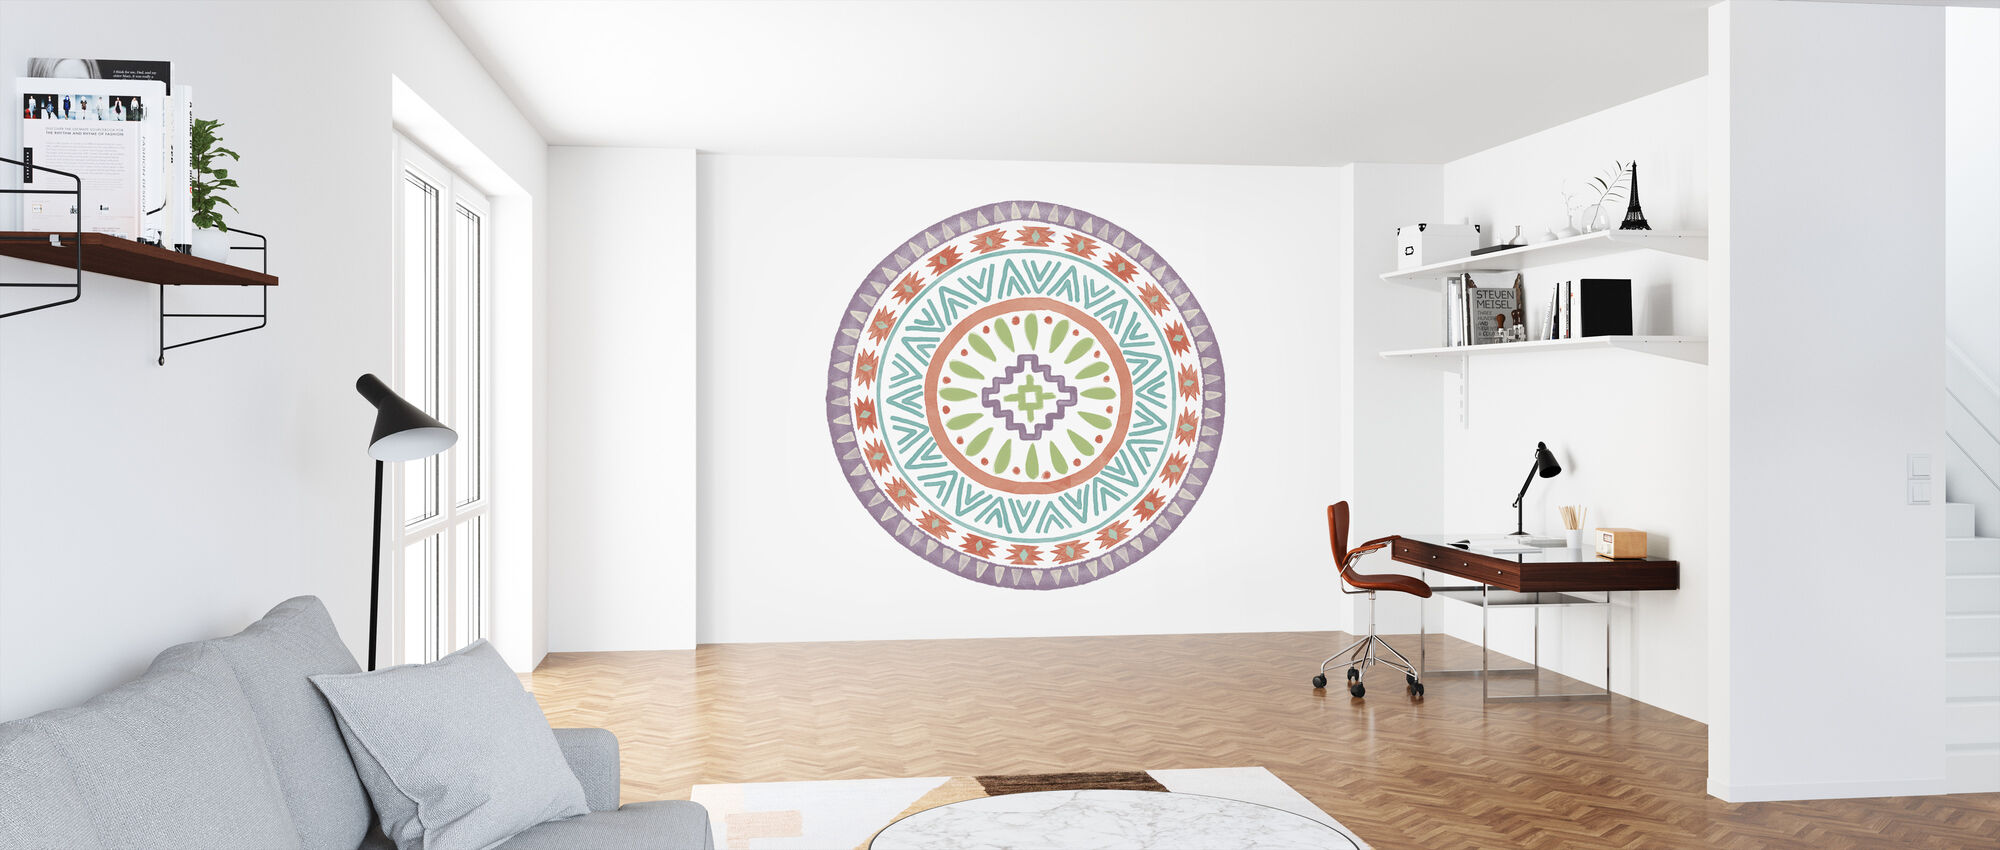 Lovely Llamas Mandala III - Wallpaper - Office